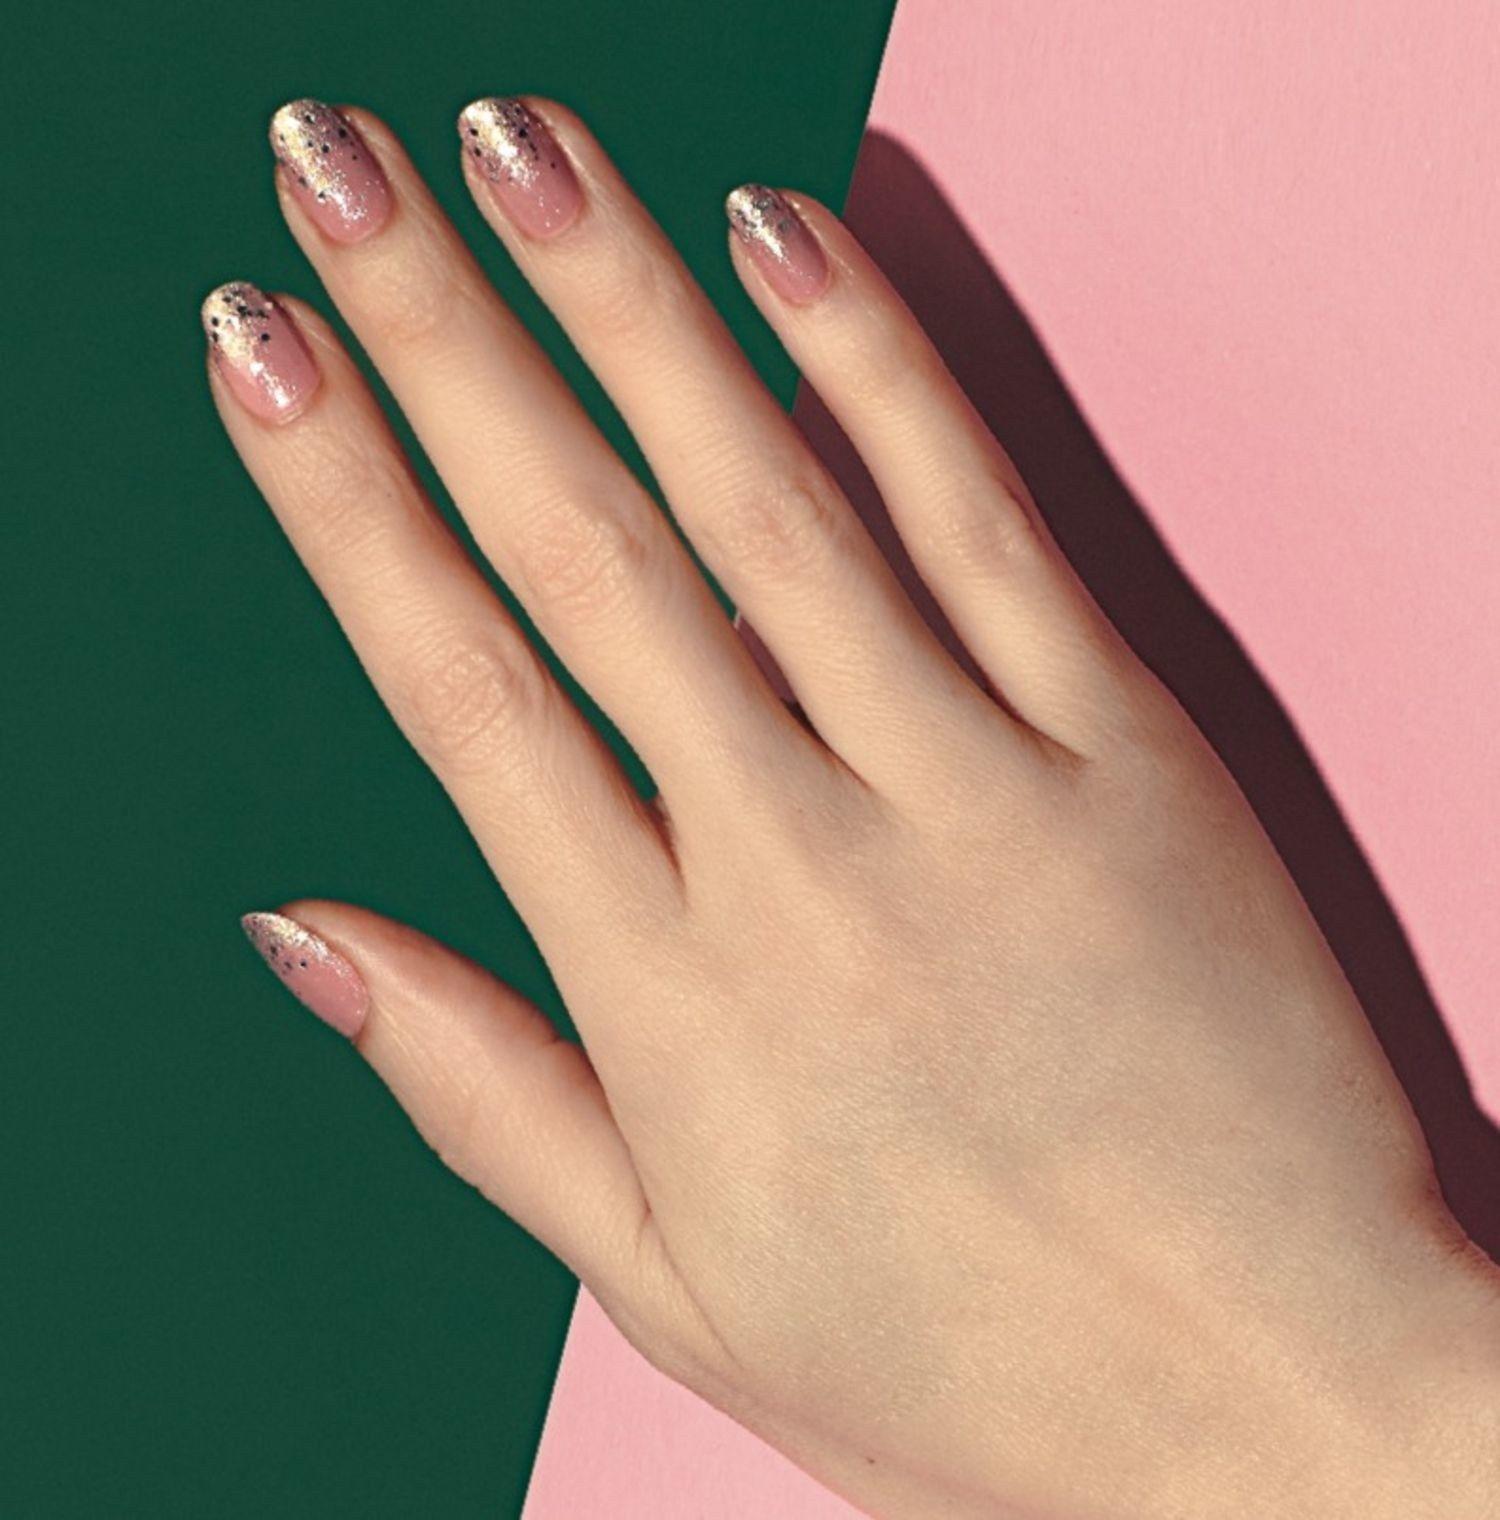 american nails stockholm